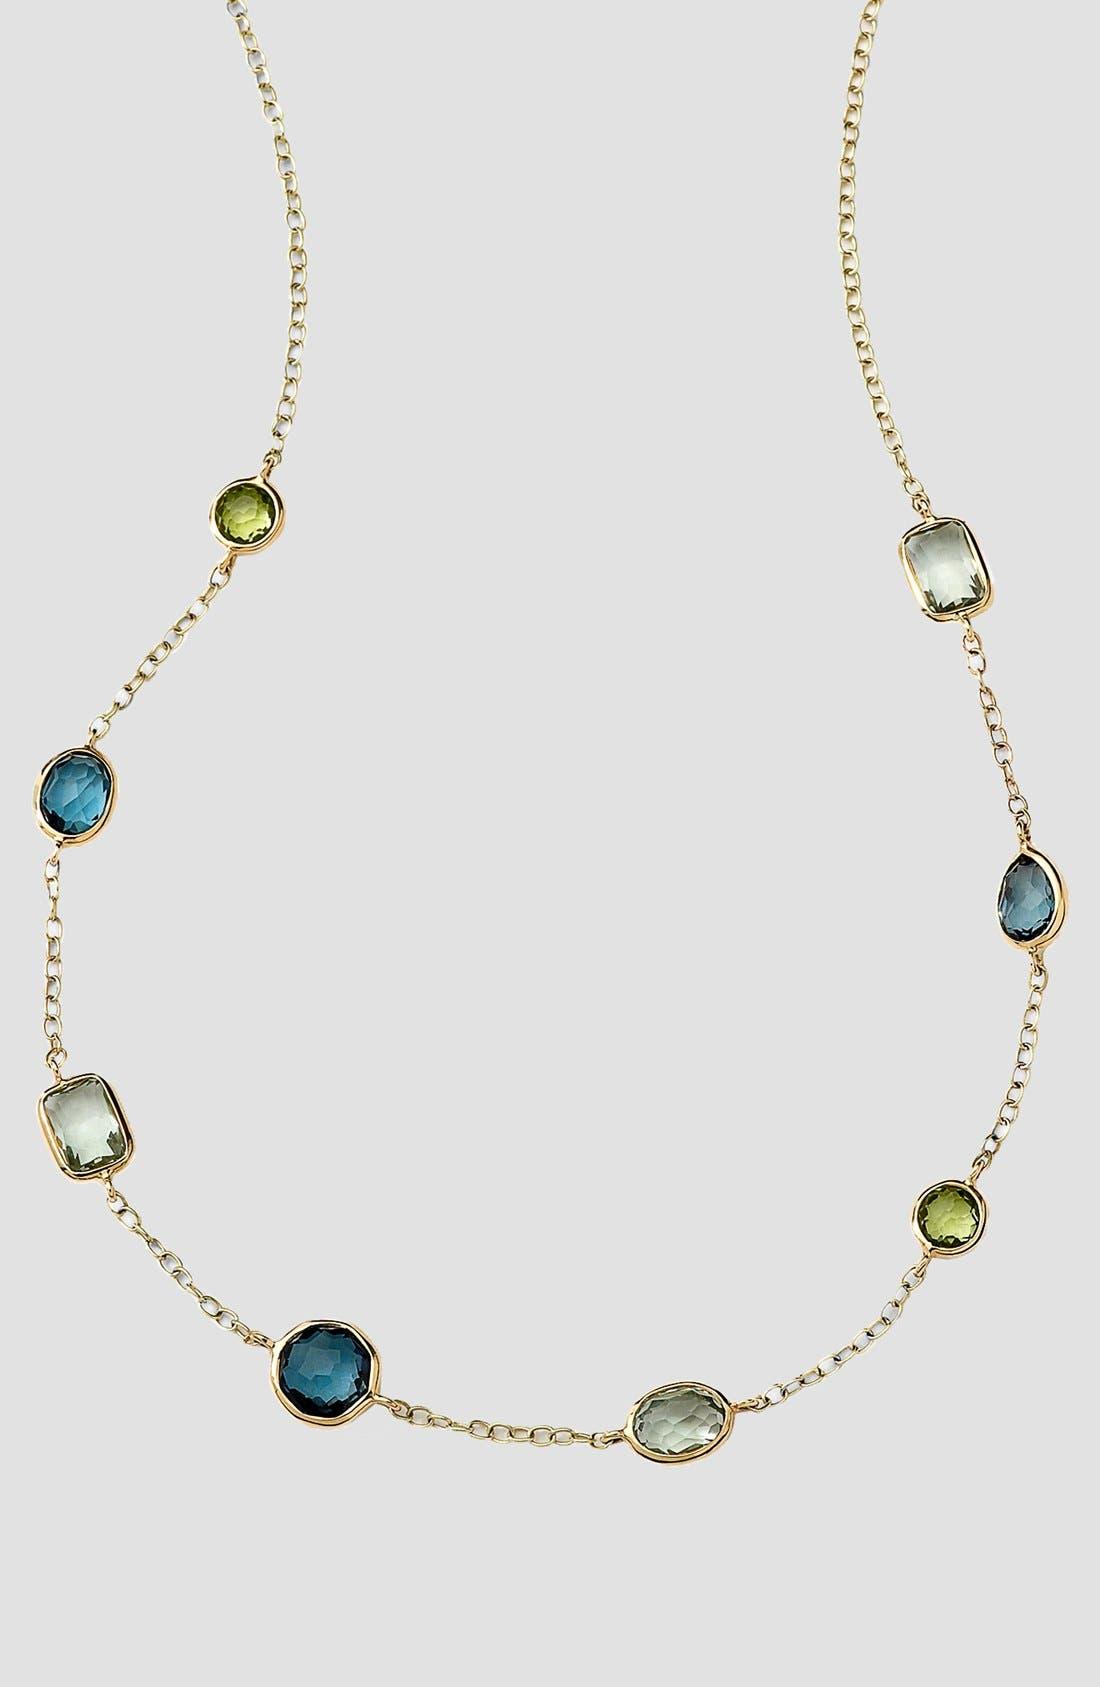 Main Image - Ippolita 'Rock Candy - Mini Gelato' 18k Gold Station Necklace